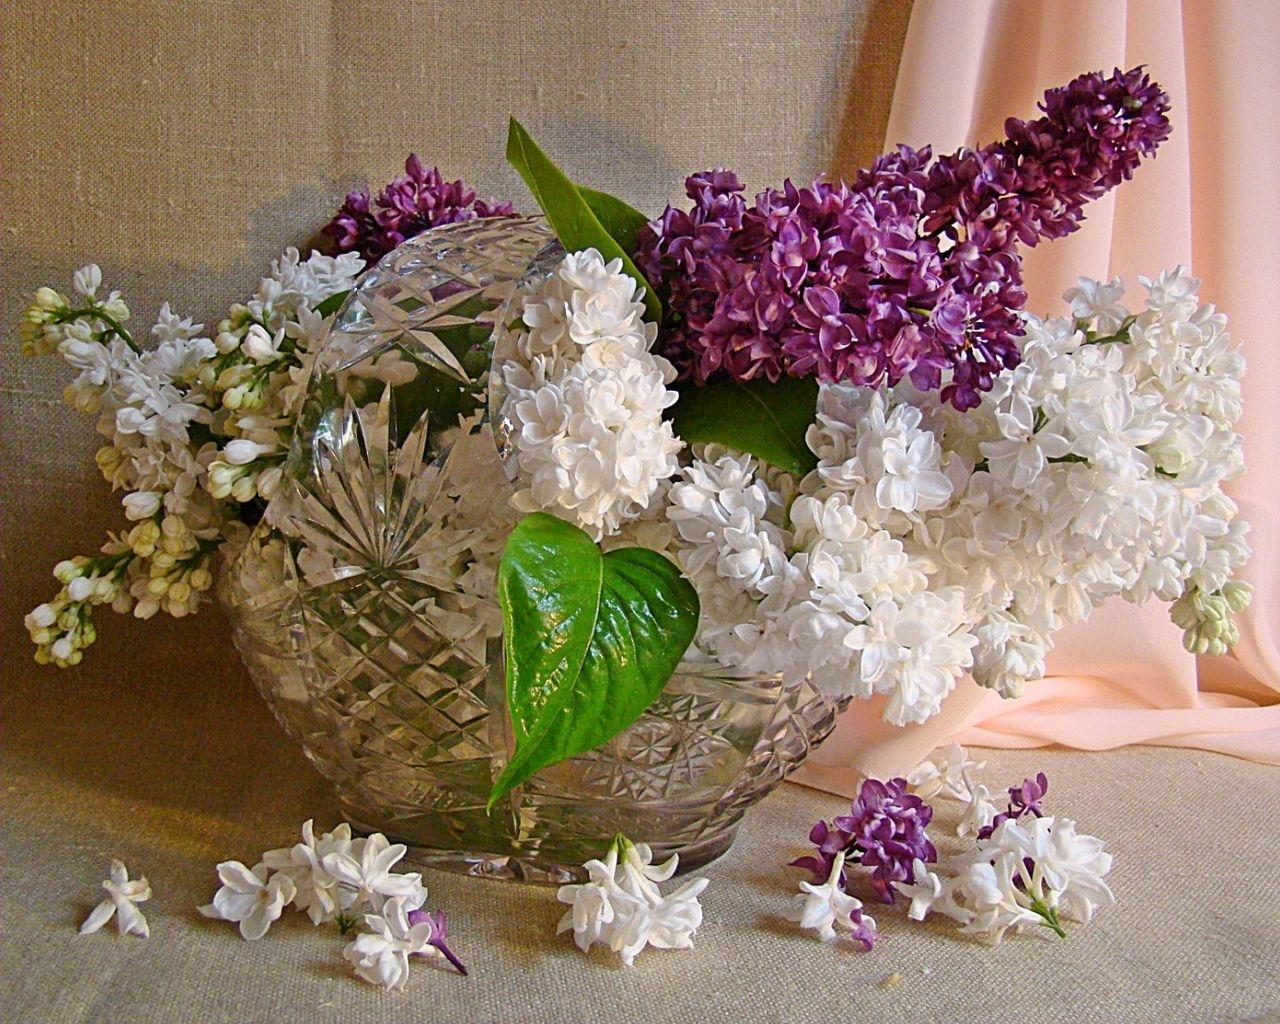 Hintergrundbilder : Blumenblätter, Kristall, Frühling